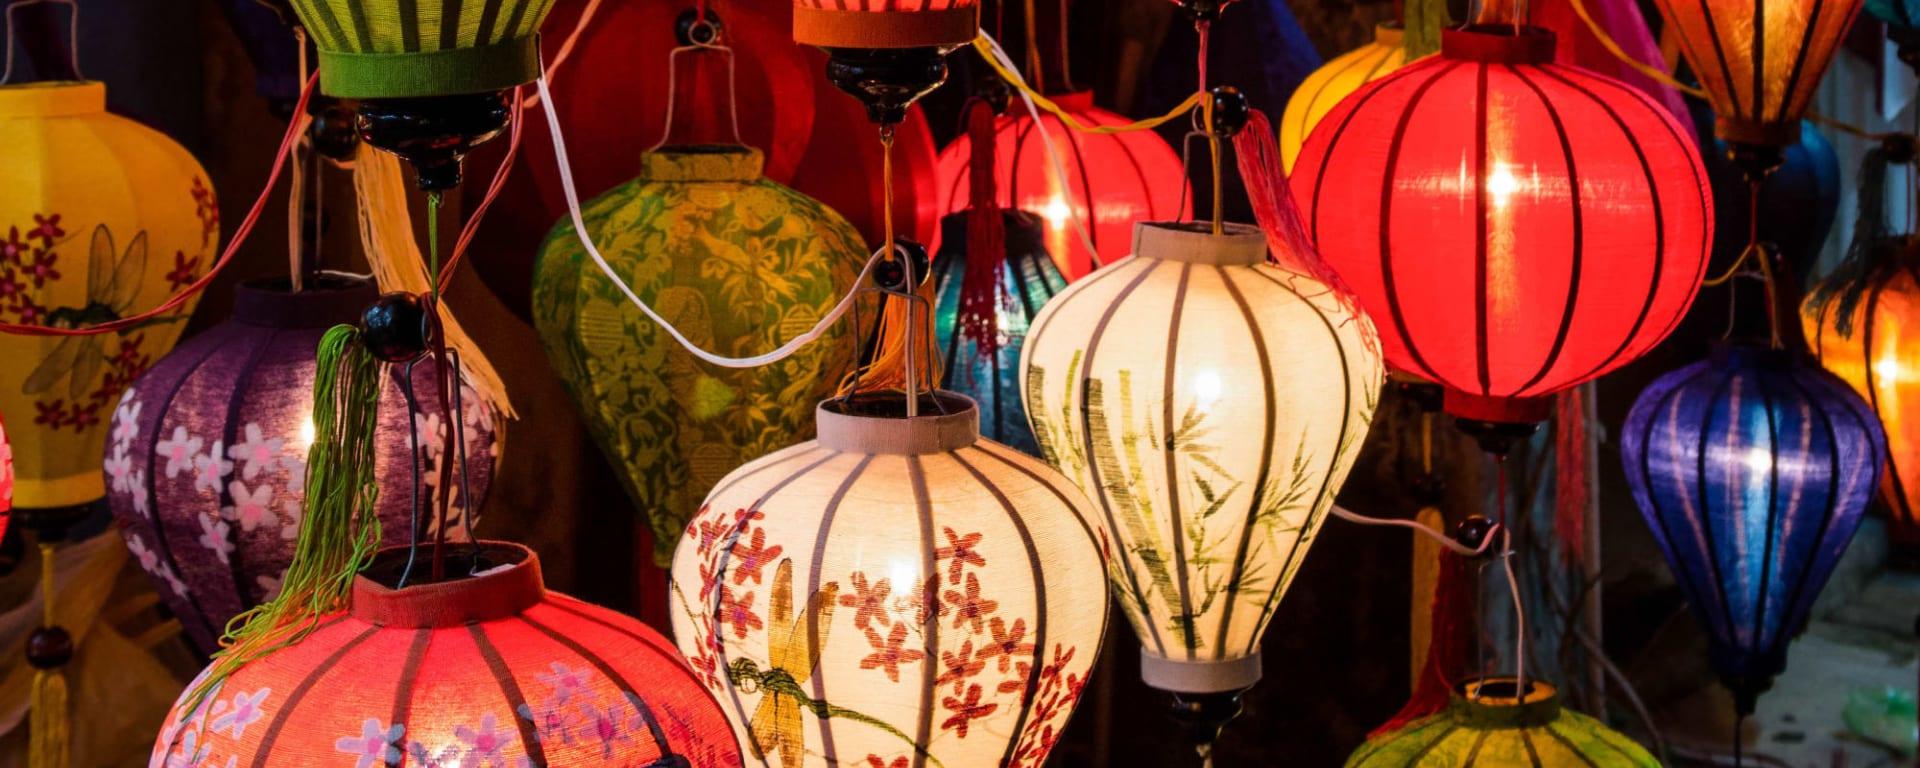 Höhepunkte Vietnams ab Hanoi: Vietnam Hoi An Laternen